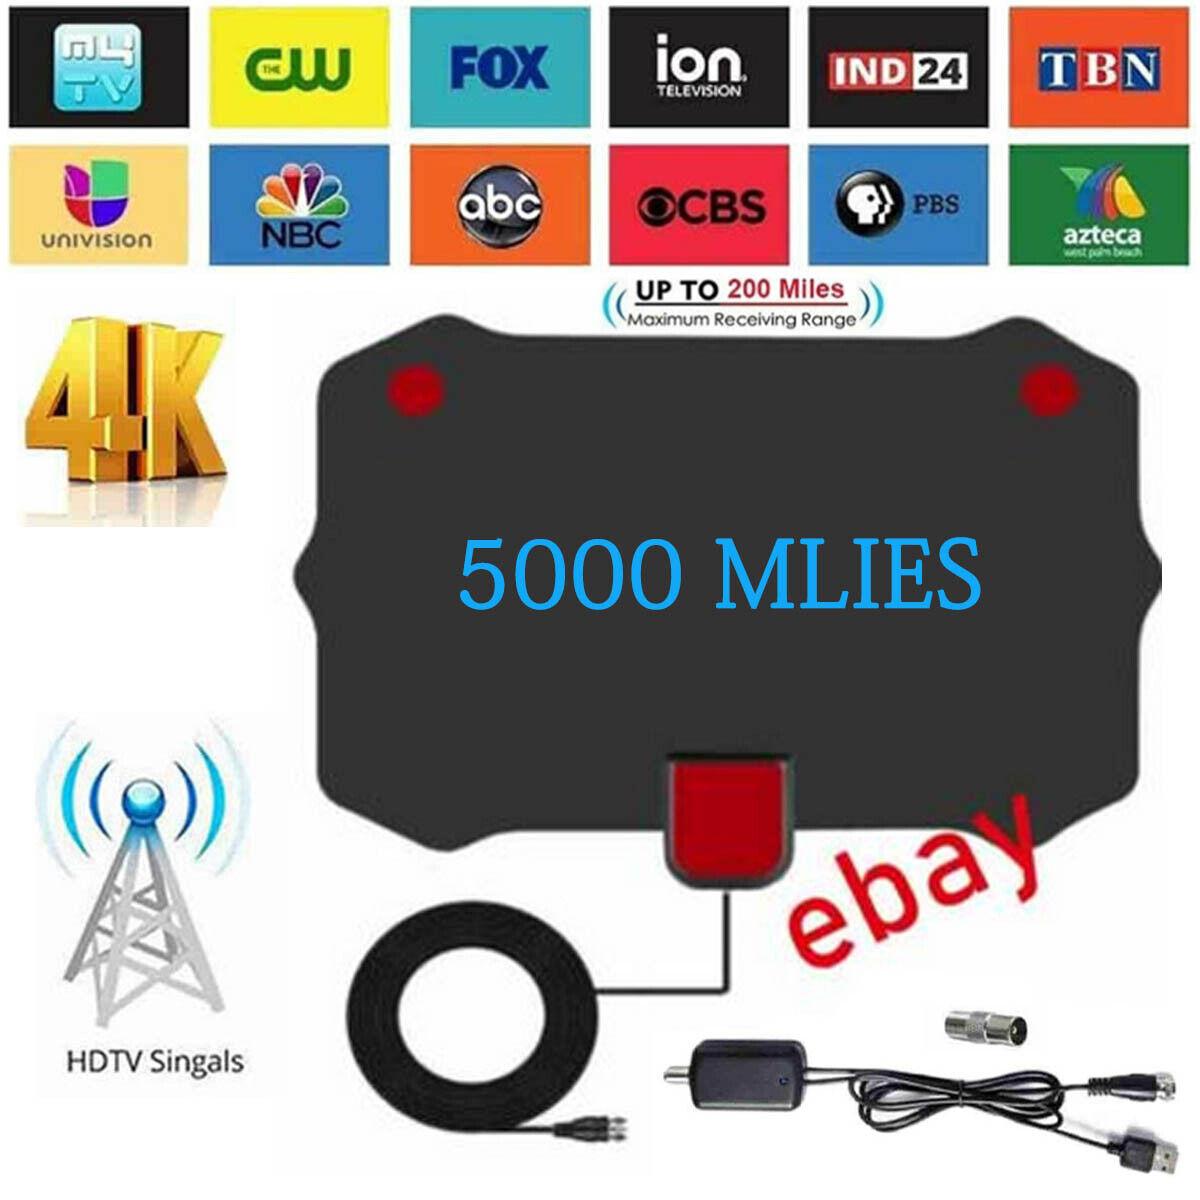 Newest Indoor Amplified Digital TV Antenna HDTV 4K 1080P Lon